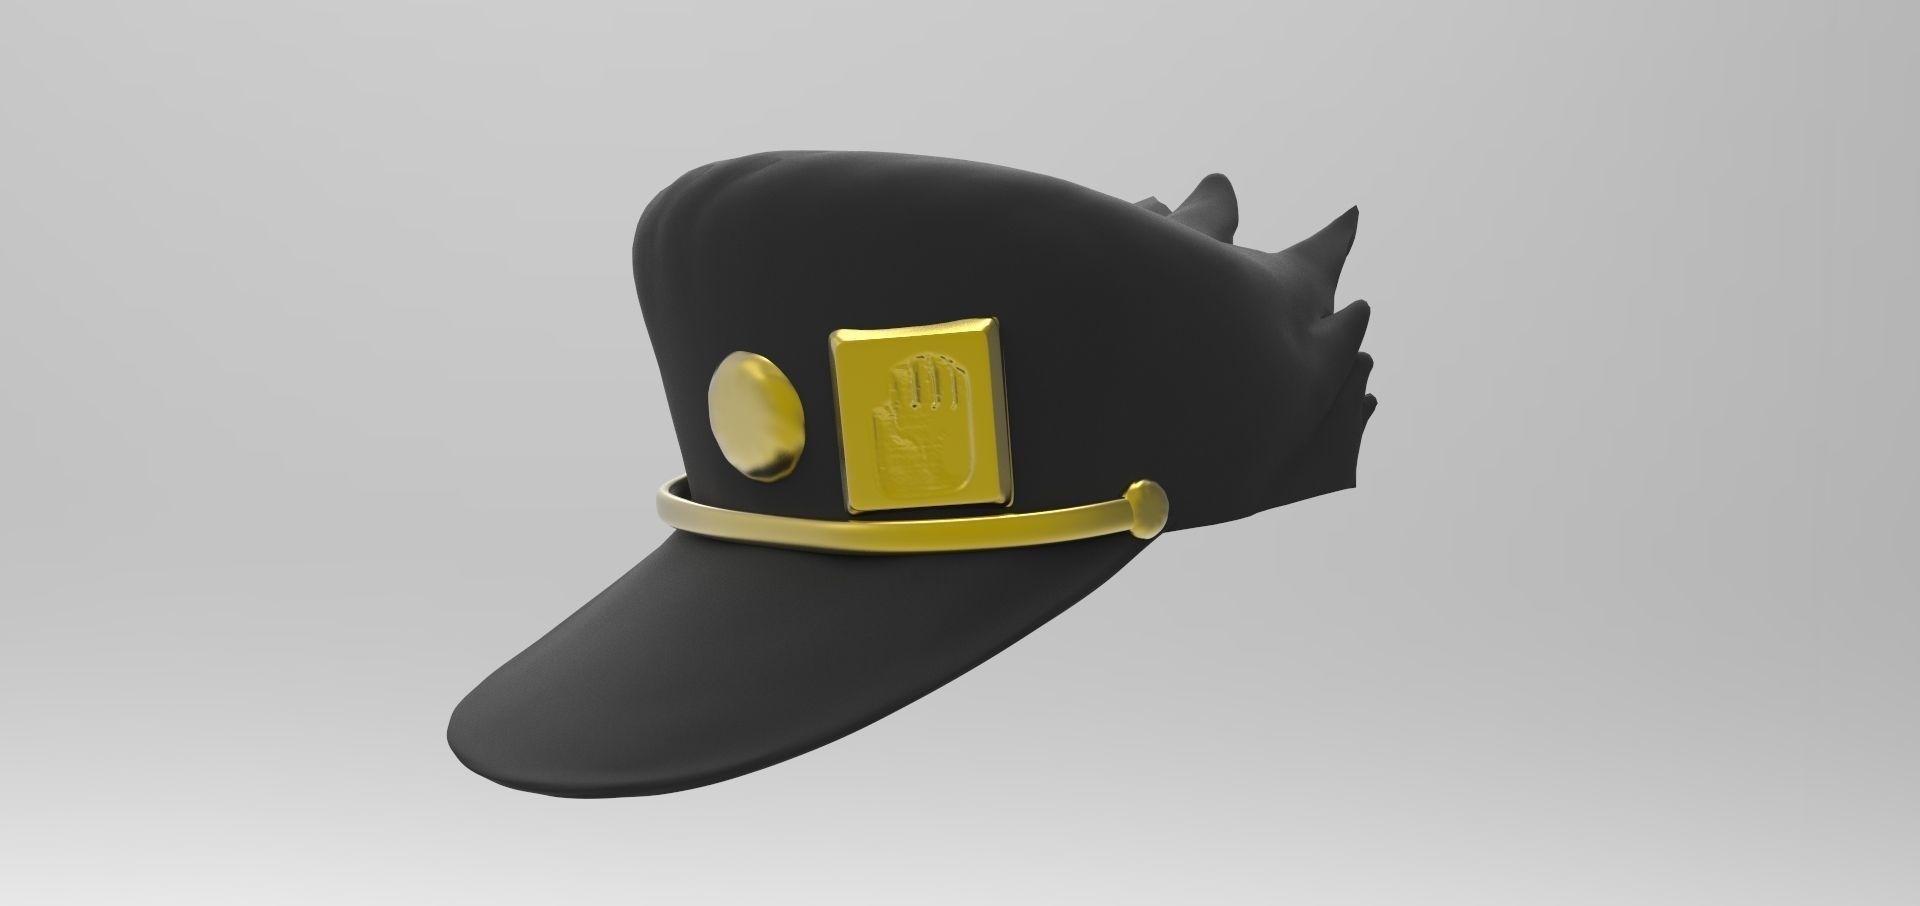 jojo-jotaro-kujo-cosplay-hat